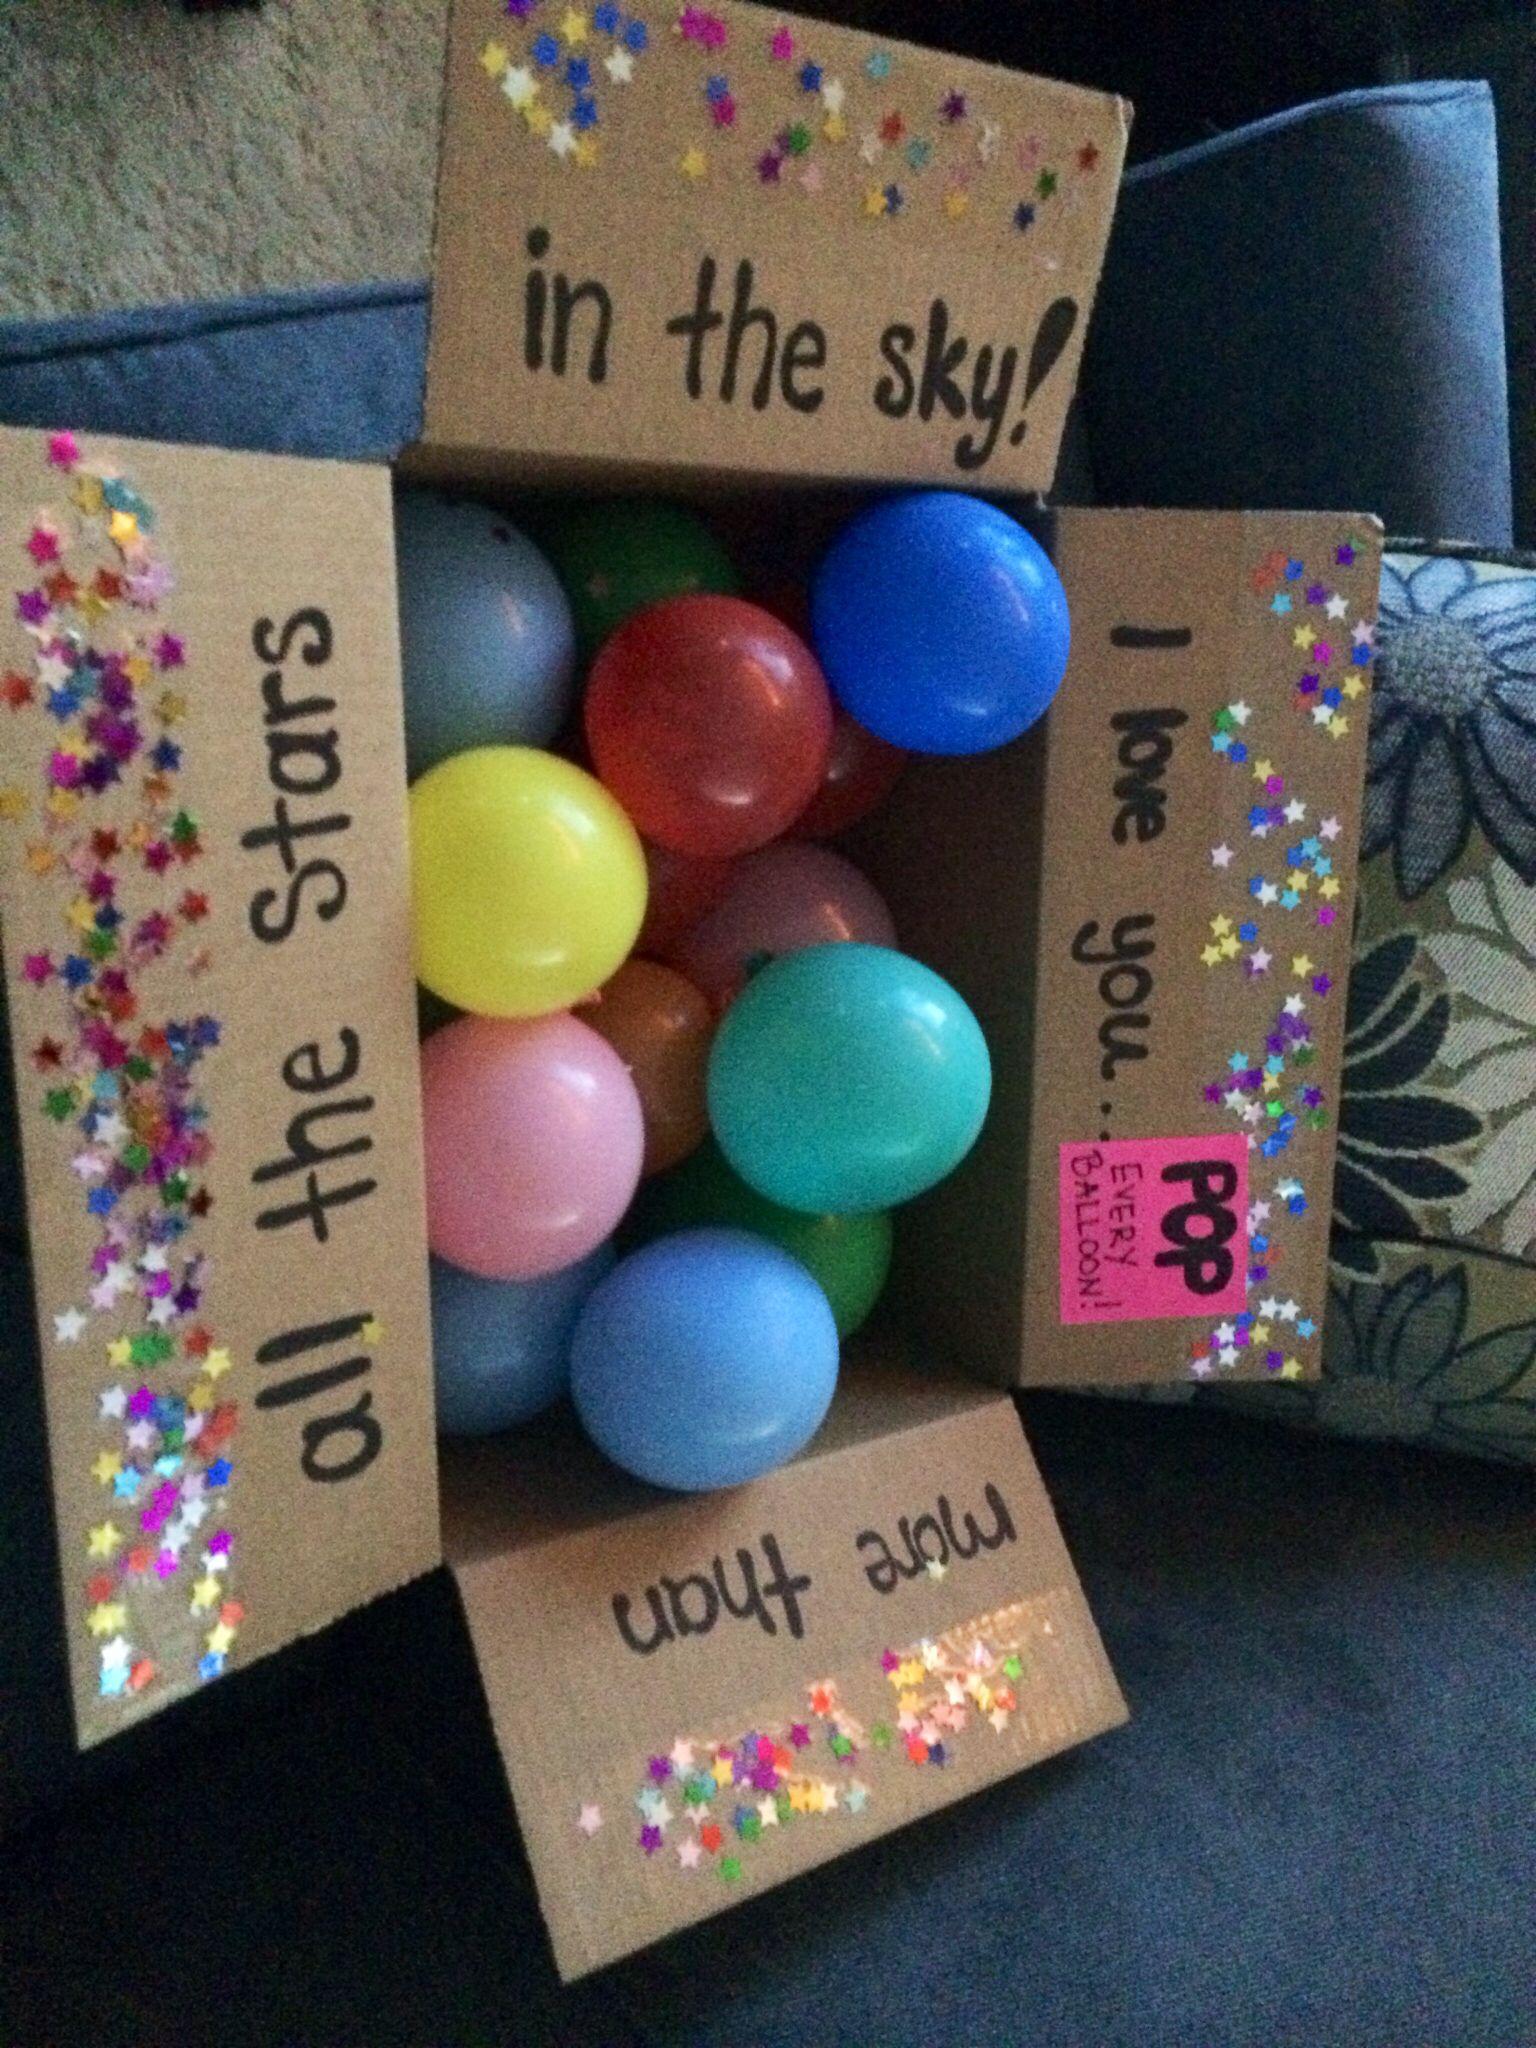 Long distance relationship fun package idea. Each